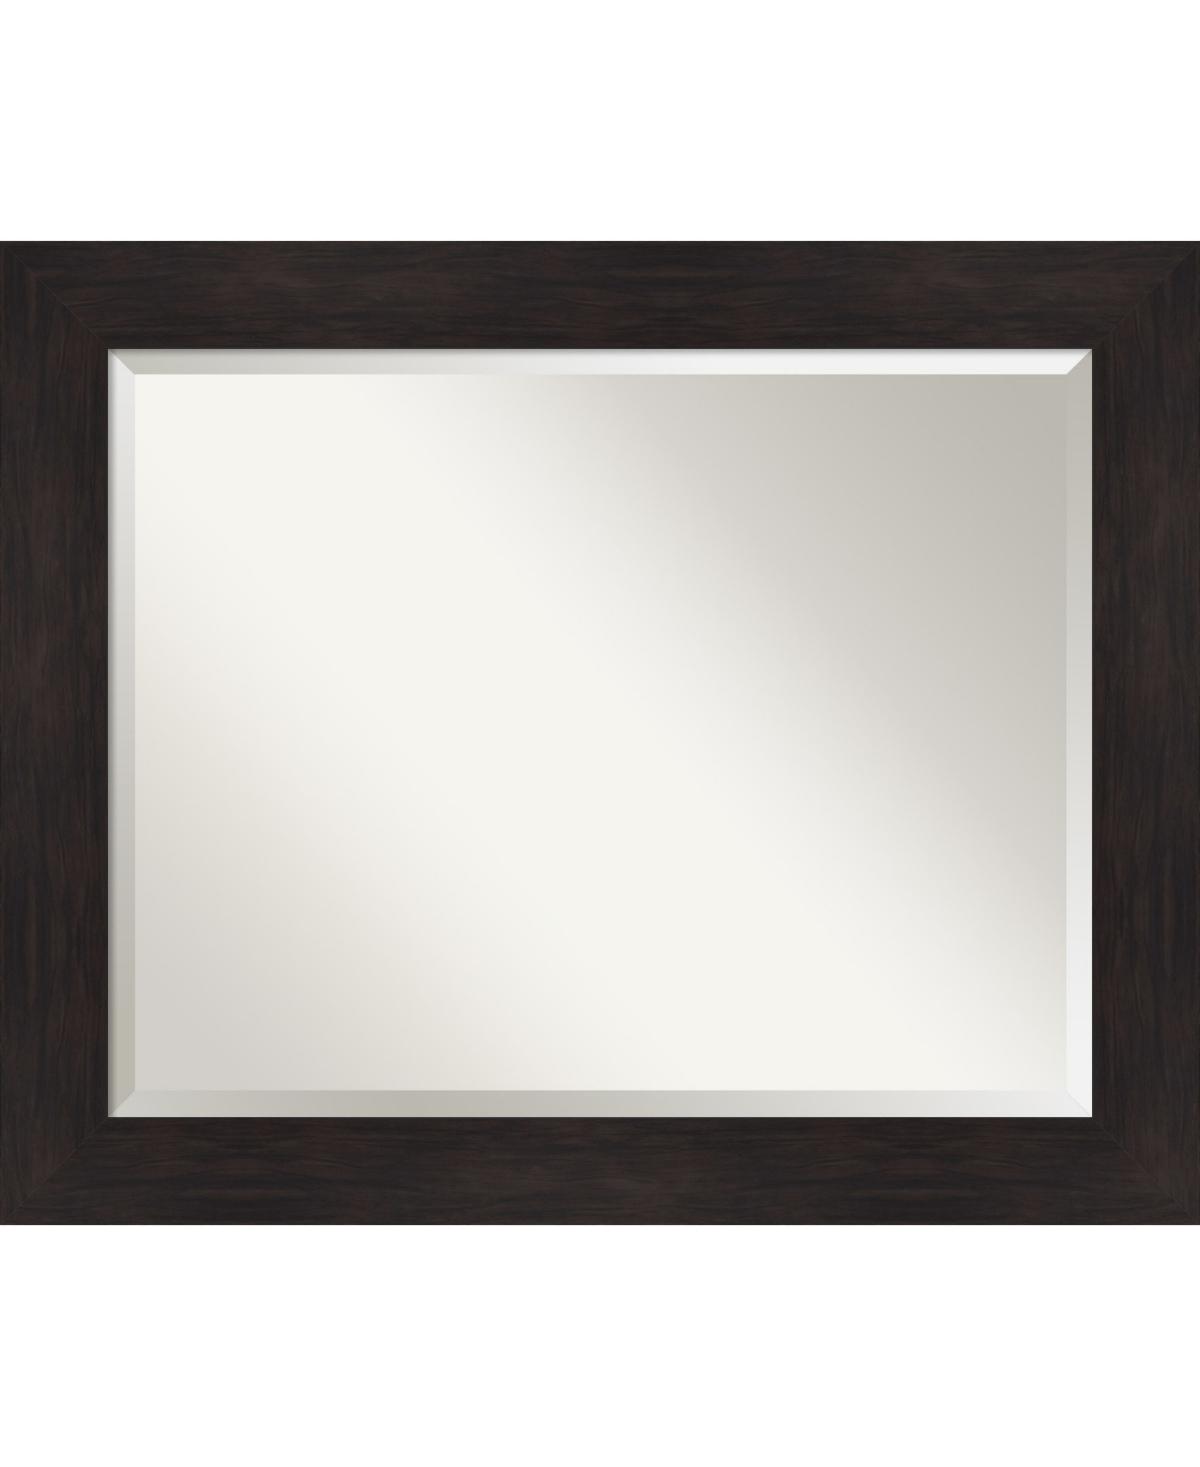 Amanti Art Furniture Framed Bathroom Vanity Wall Mirror, 33.38